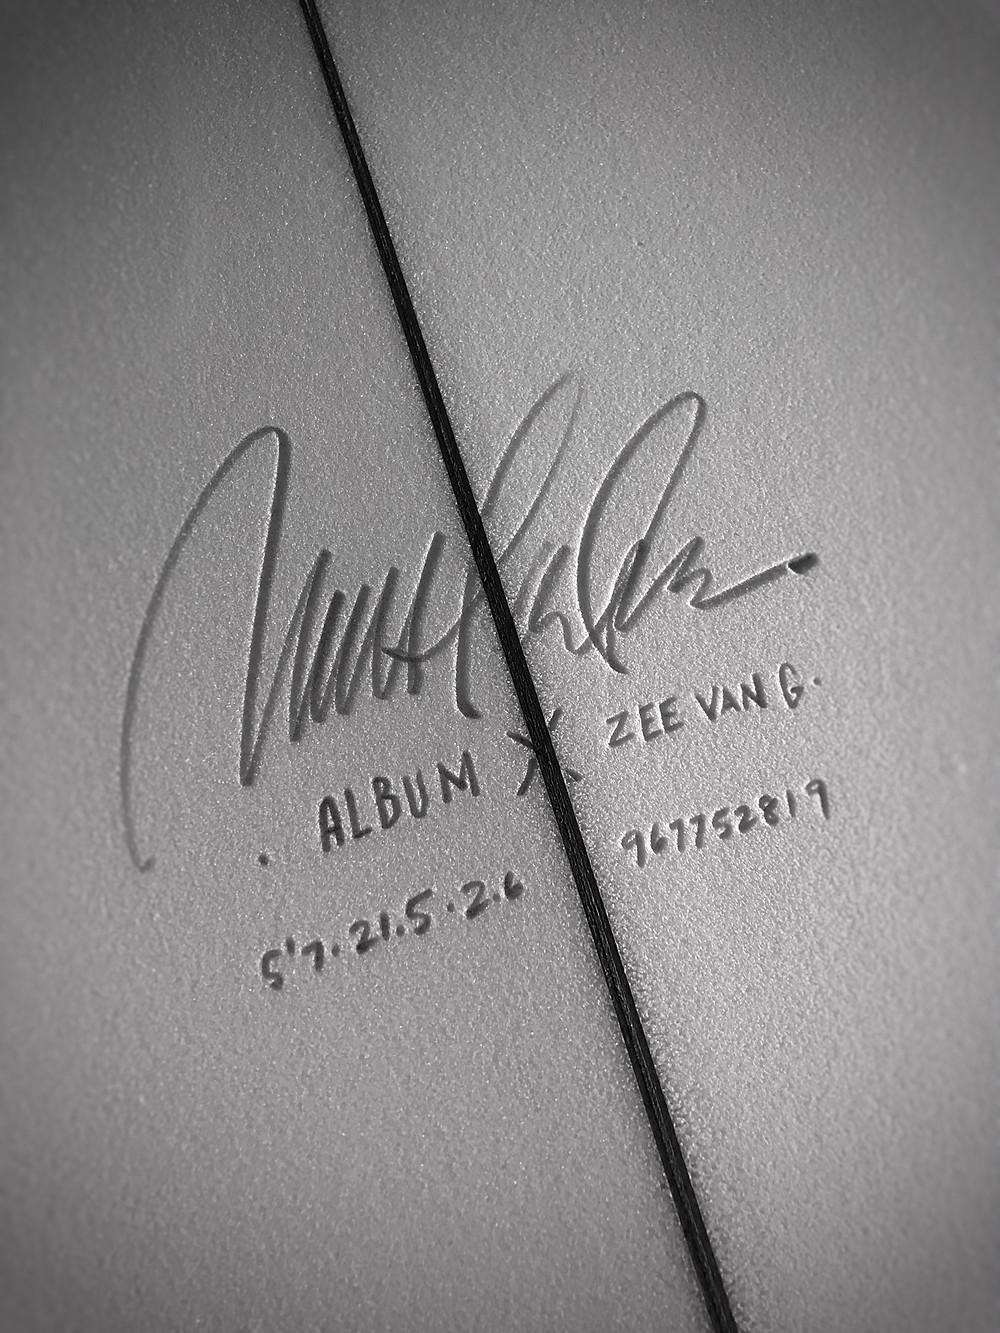 ALBUM X ZEE (photo by Matt Parker)